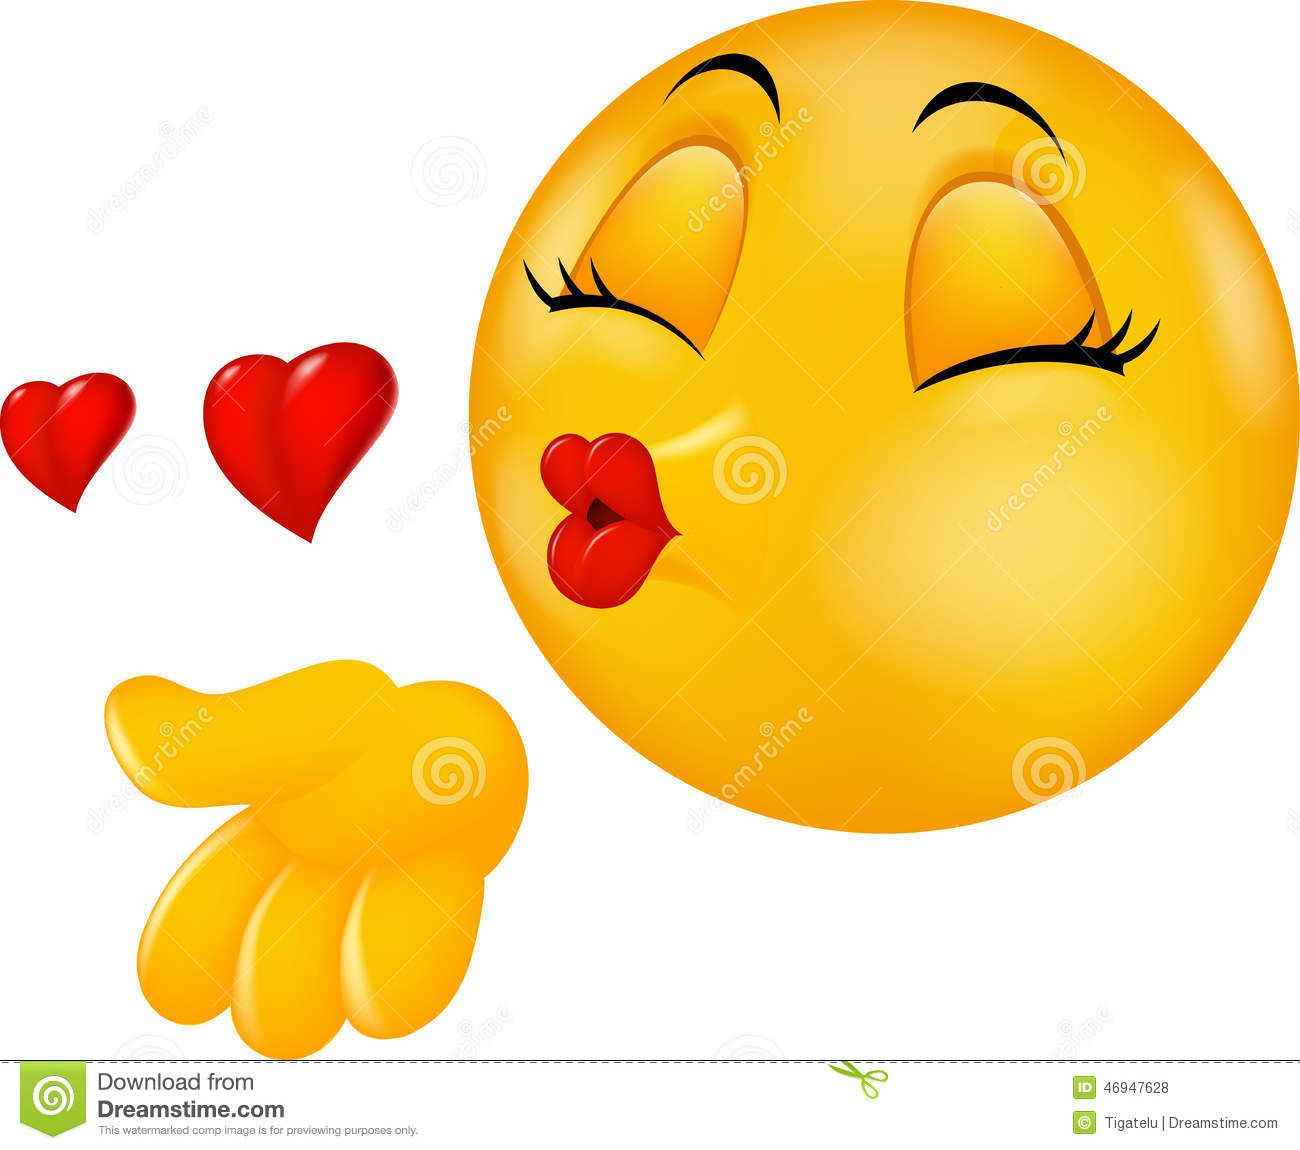 kiss emoticon royalty free stock image - image: 14654286 | kiss